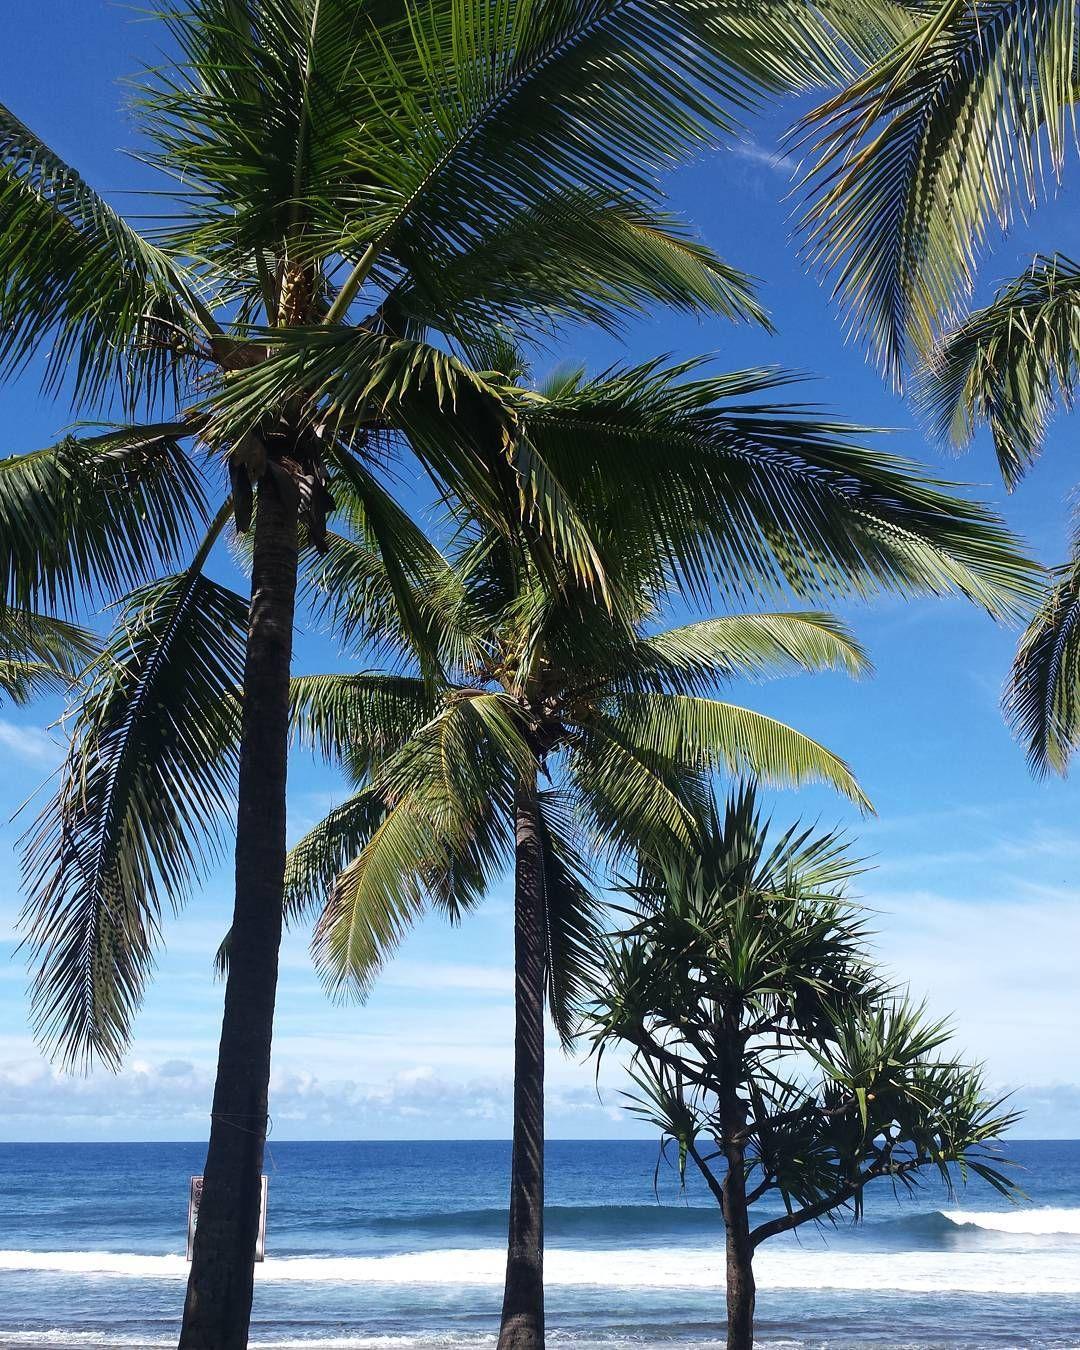 #974 #lareunion #sudsauvage #grandeanse #palm #indianocean #beach by franckchaz